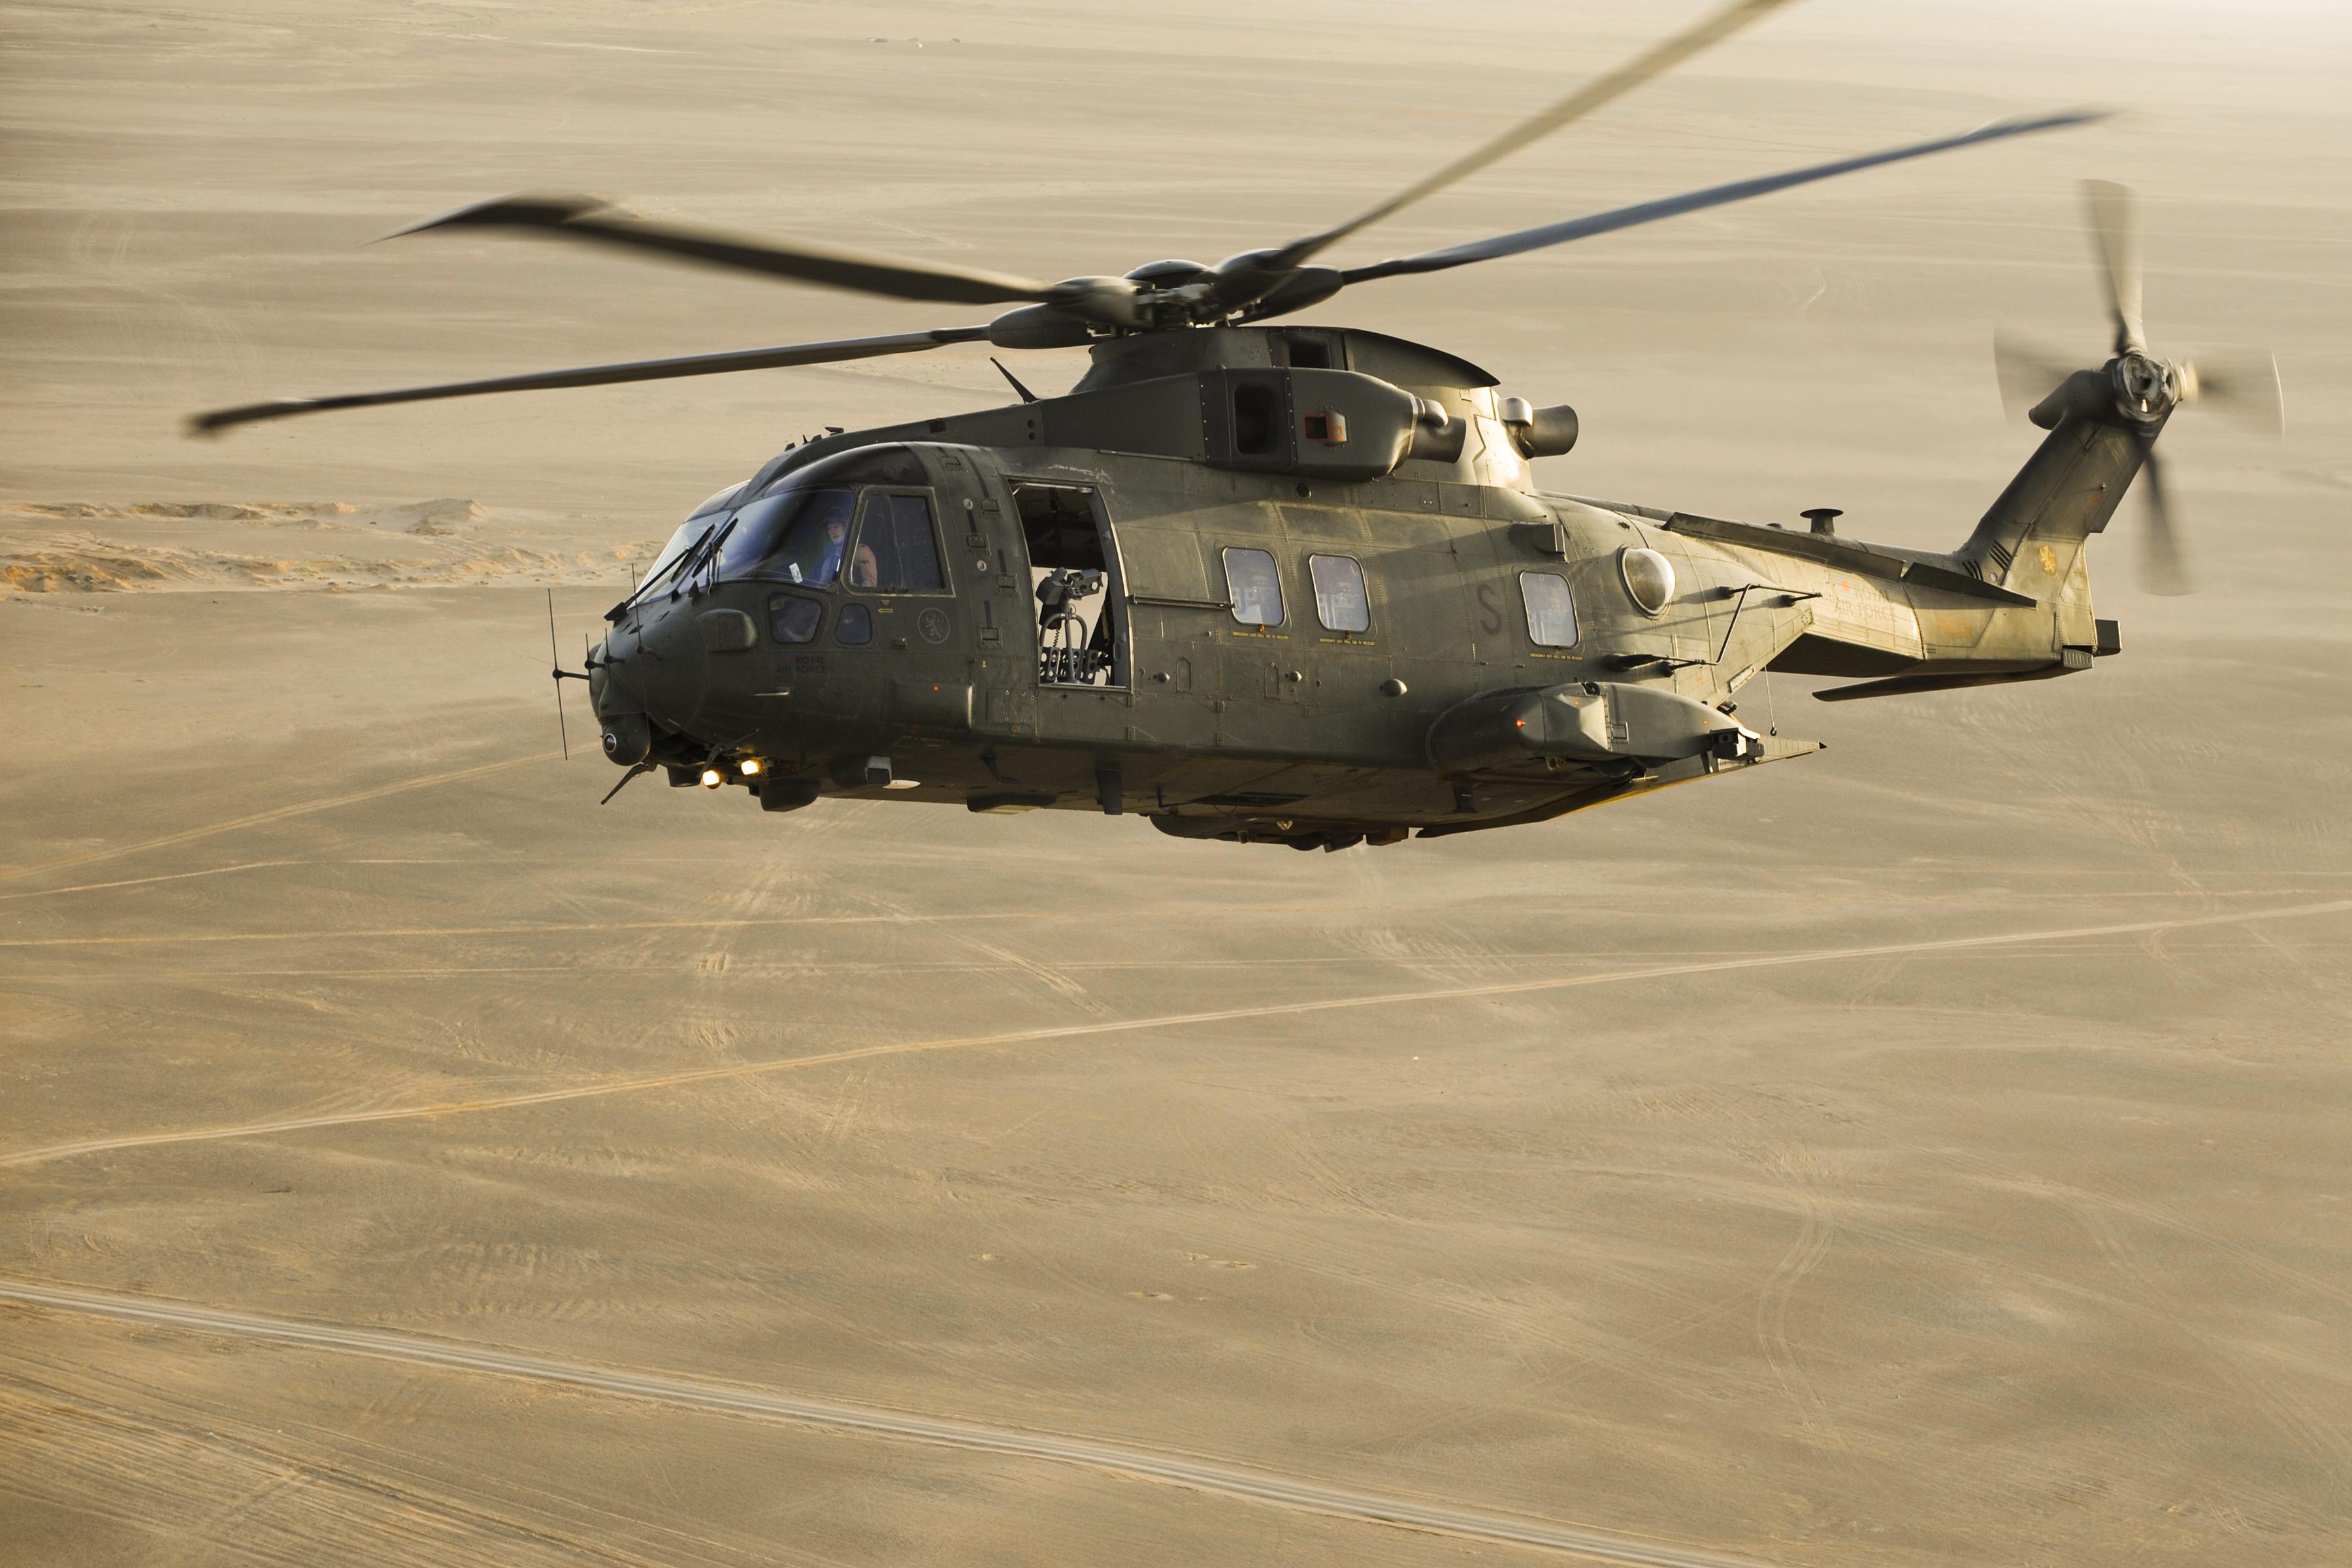 File:RAF Merlin Helicopter During Exercise Desert Vortex MOD